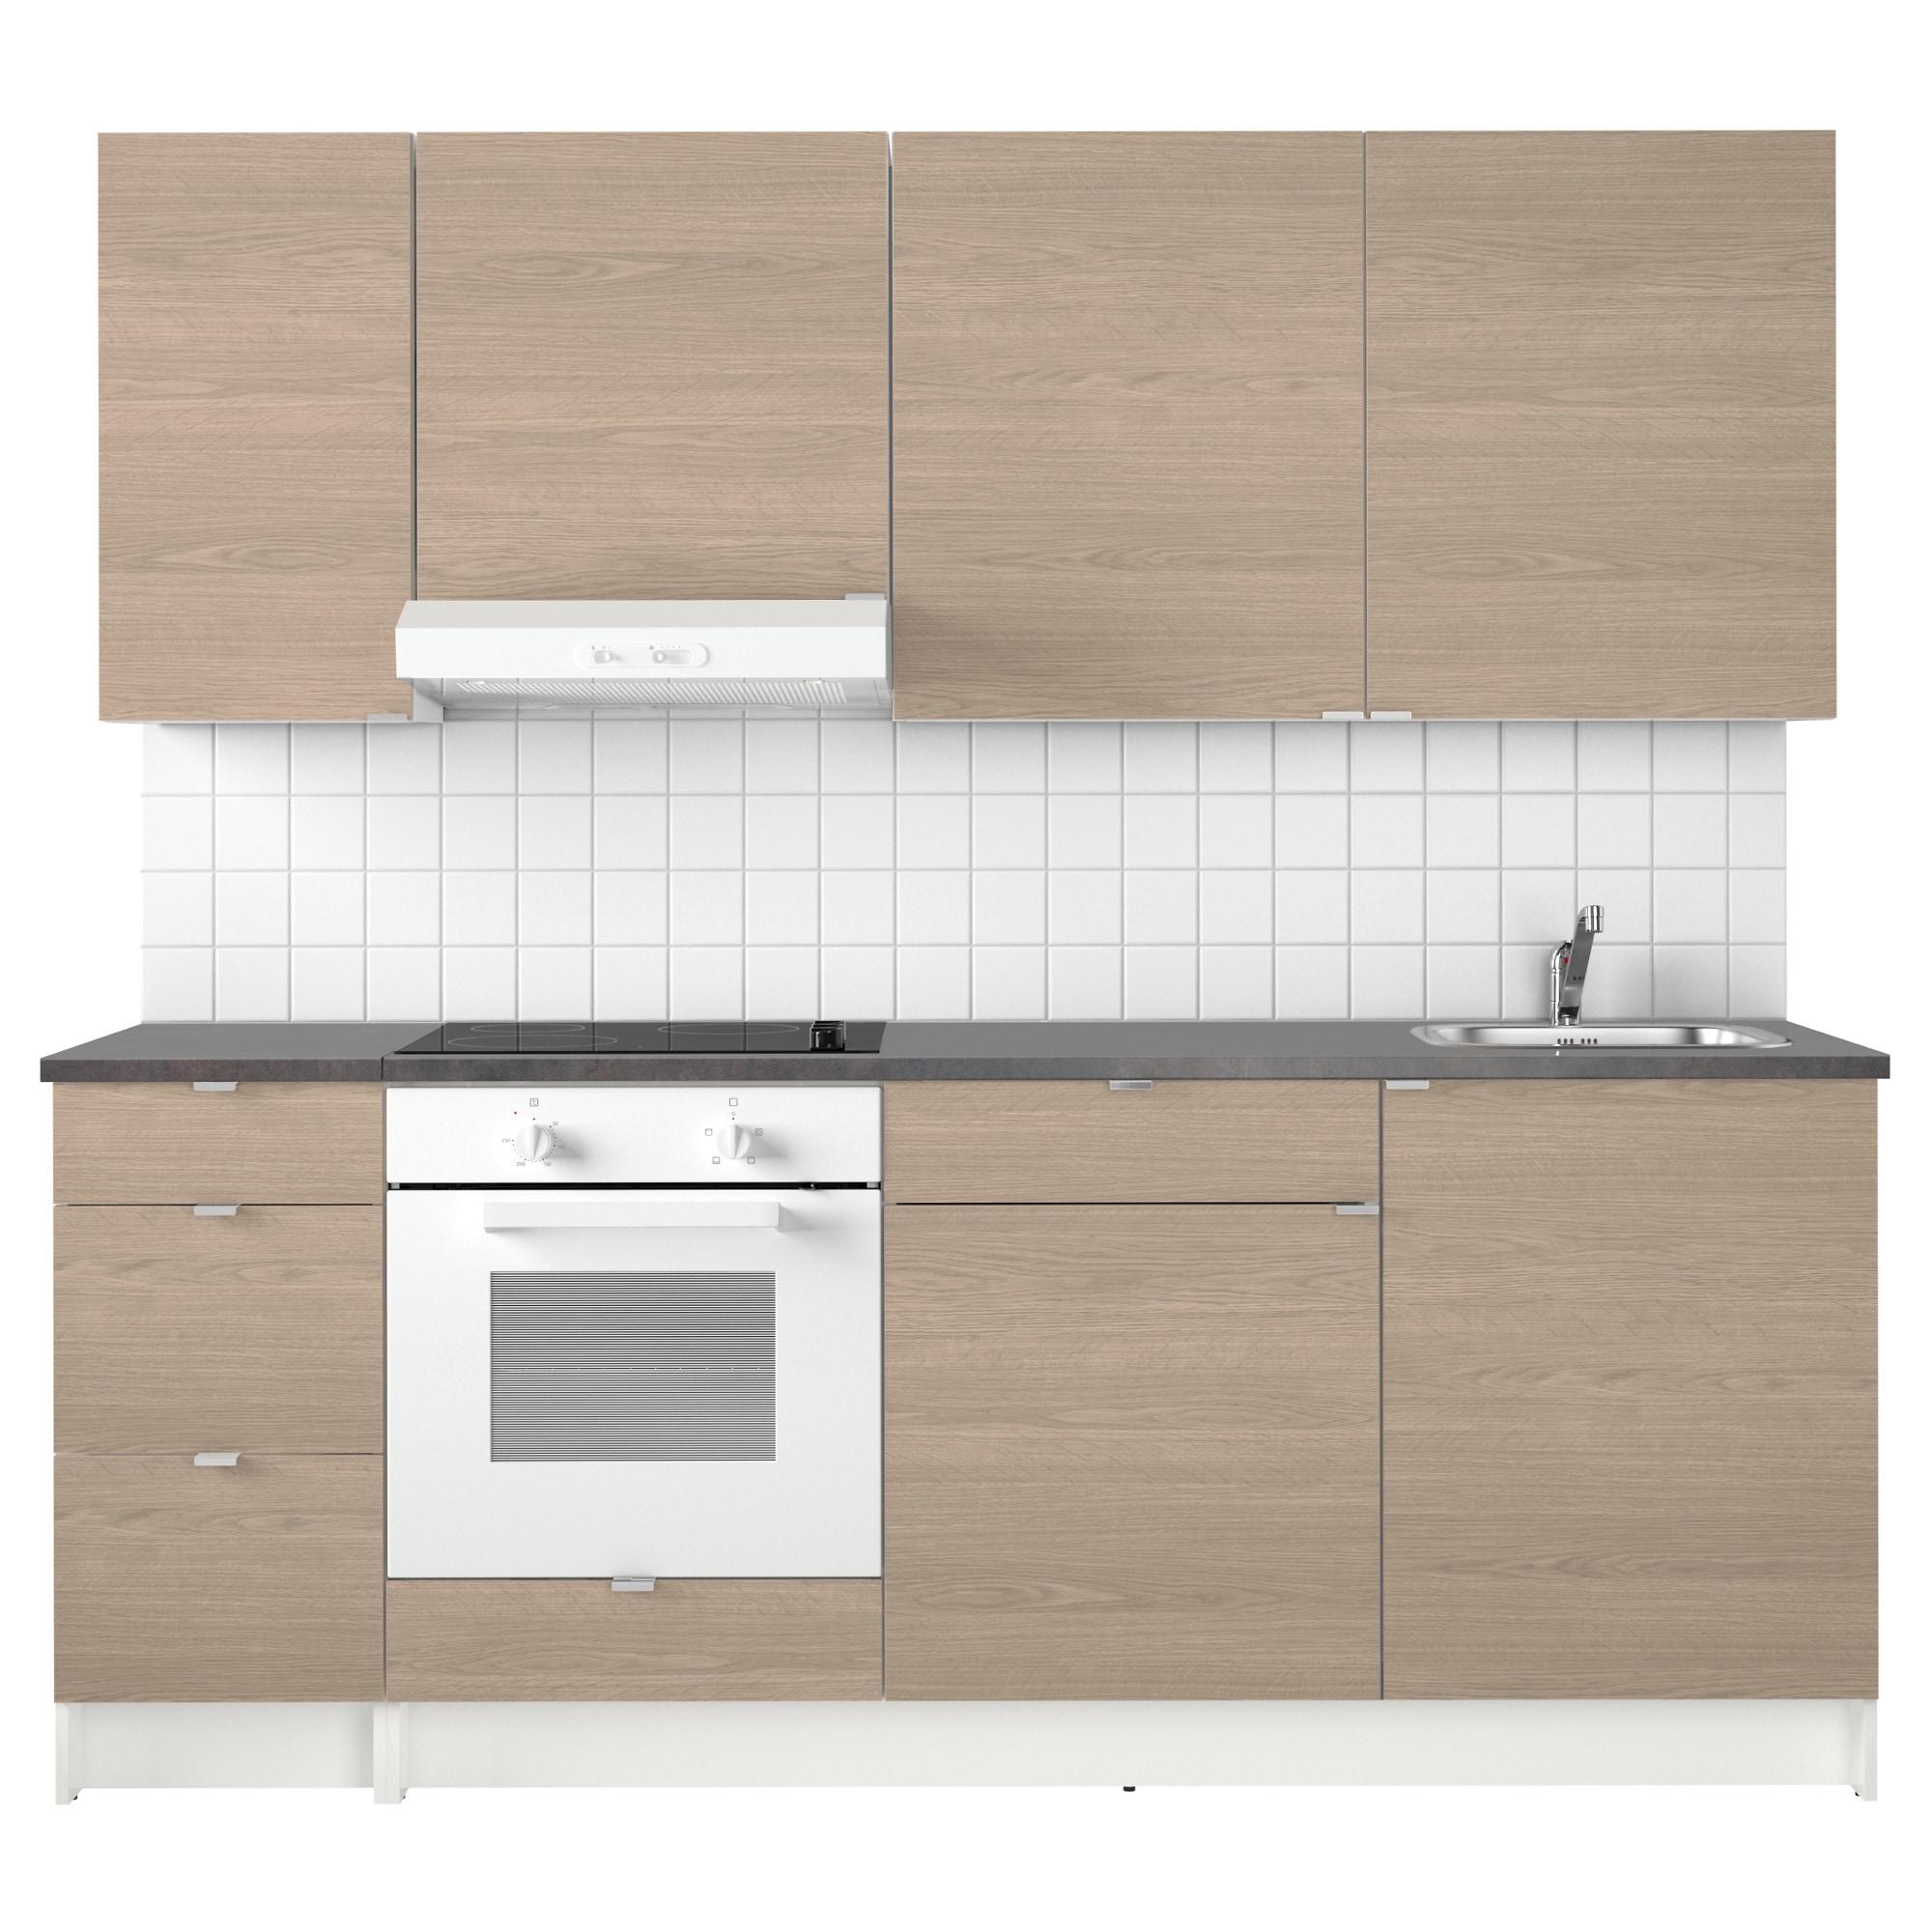 Full Size of Ikea Minikche Ideen Vrde Singlekche Pantrykche Gebraucht Pentryküche Küche Pentryküche